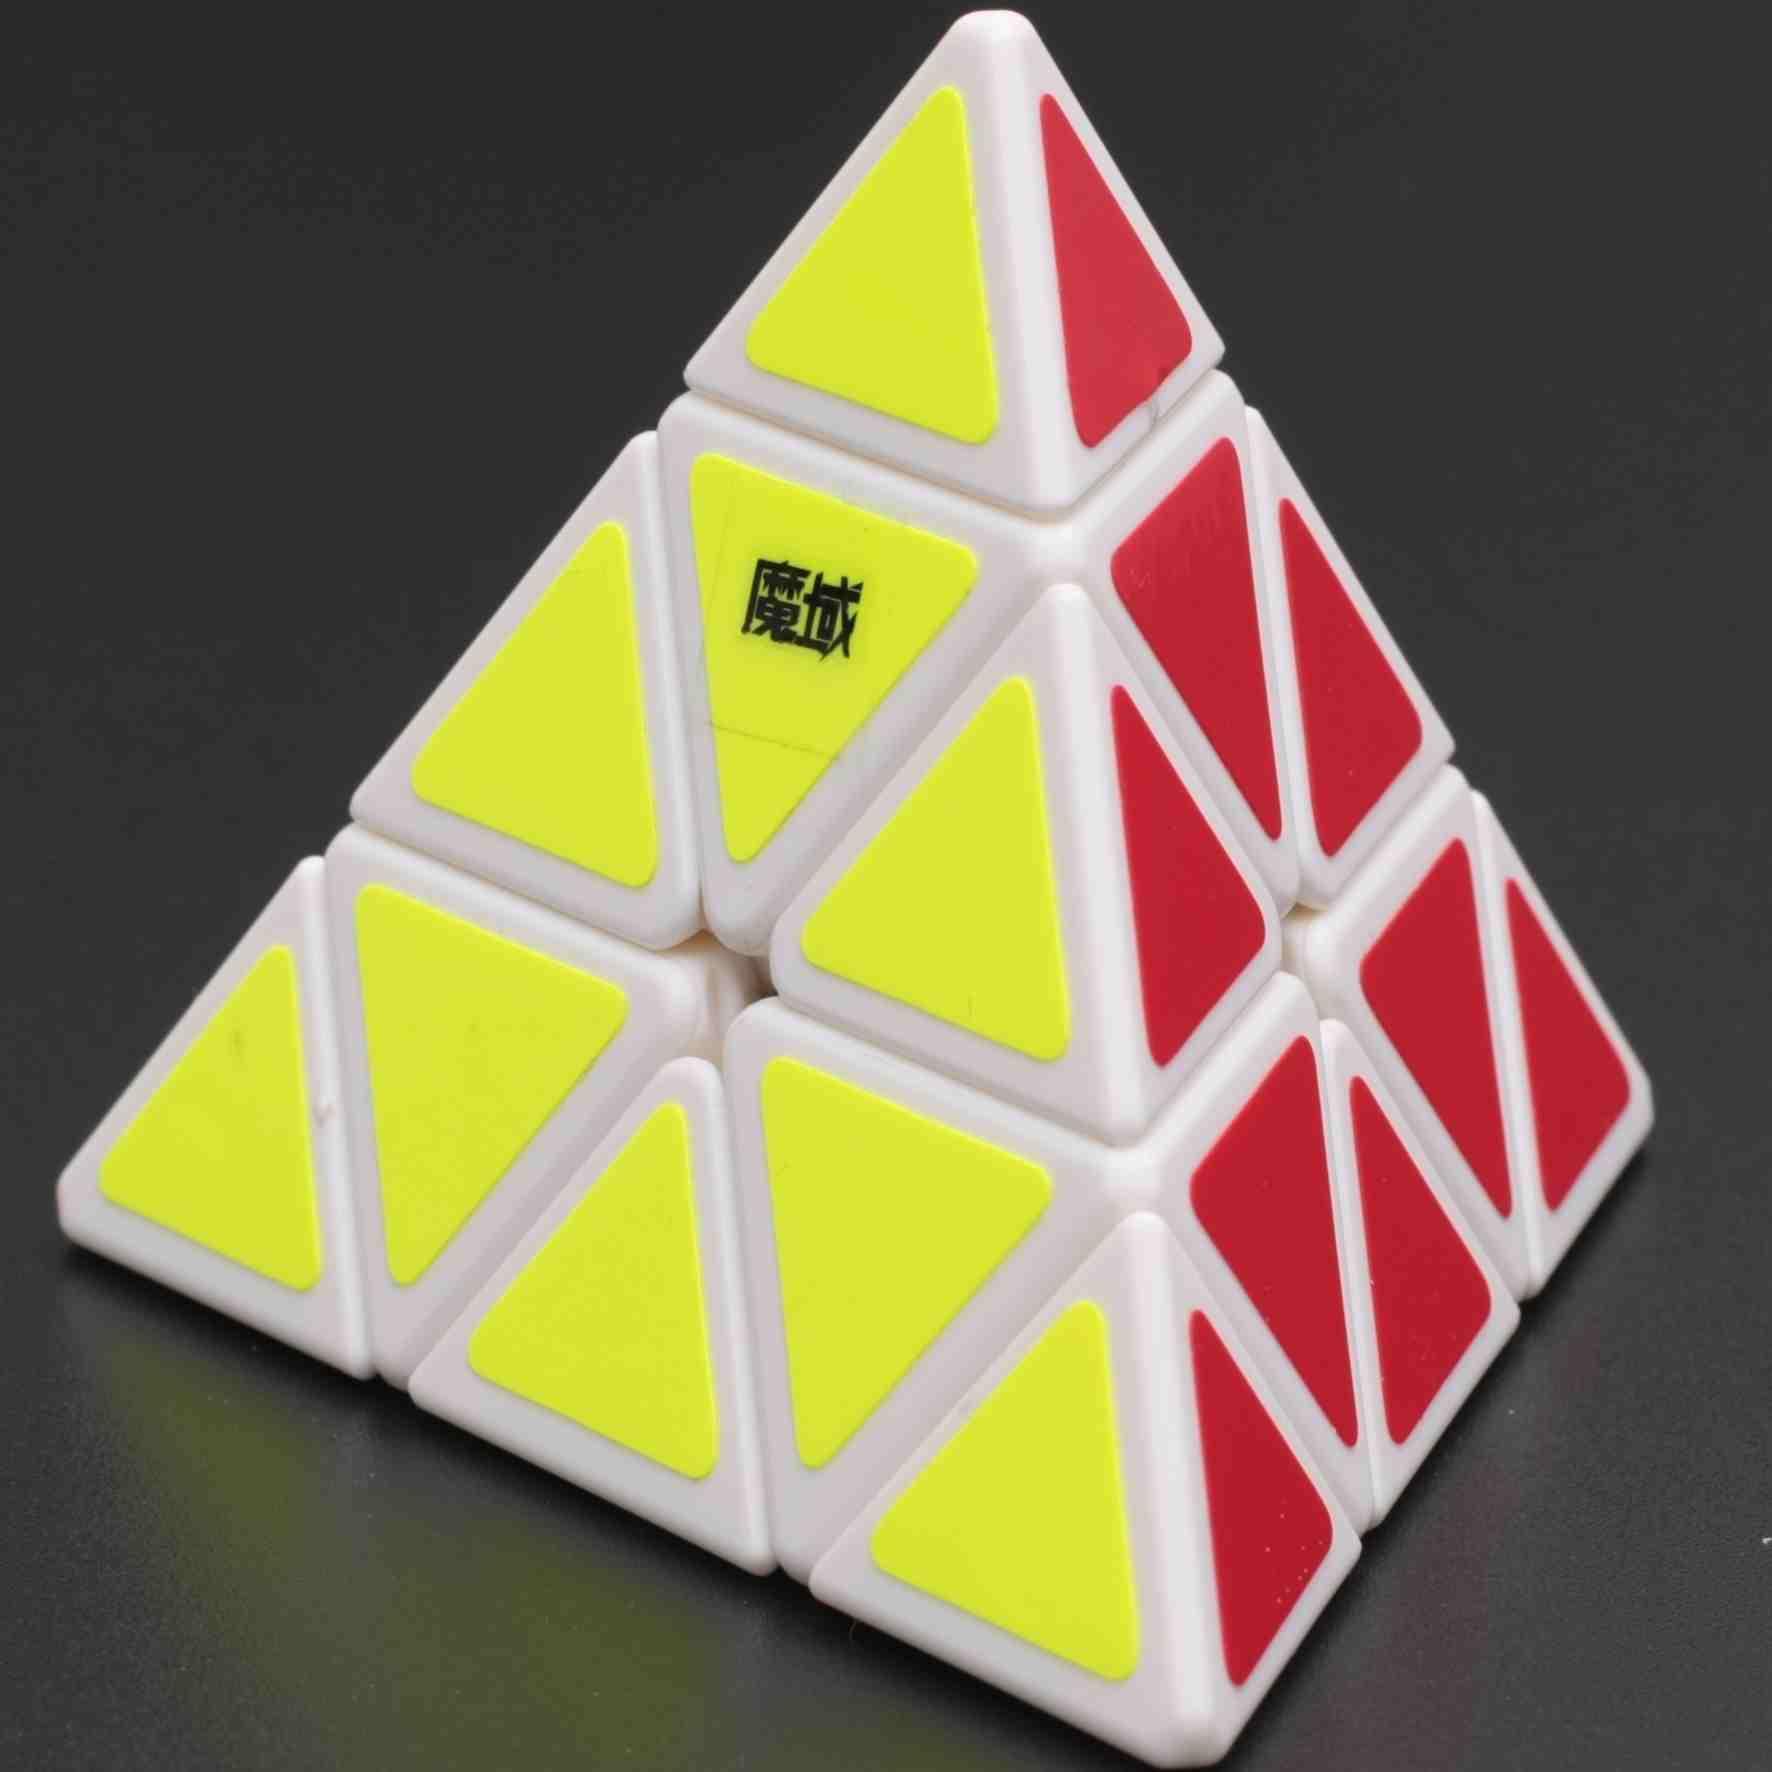 FO 永駿魔域金字塔三階黑白色魔術方塊 3階 pyraminx 祈禱塔 異形 玩具